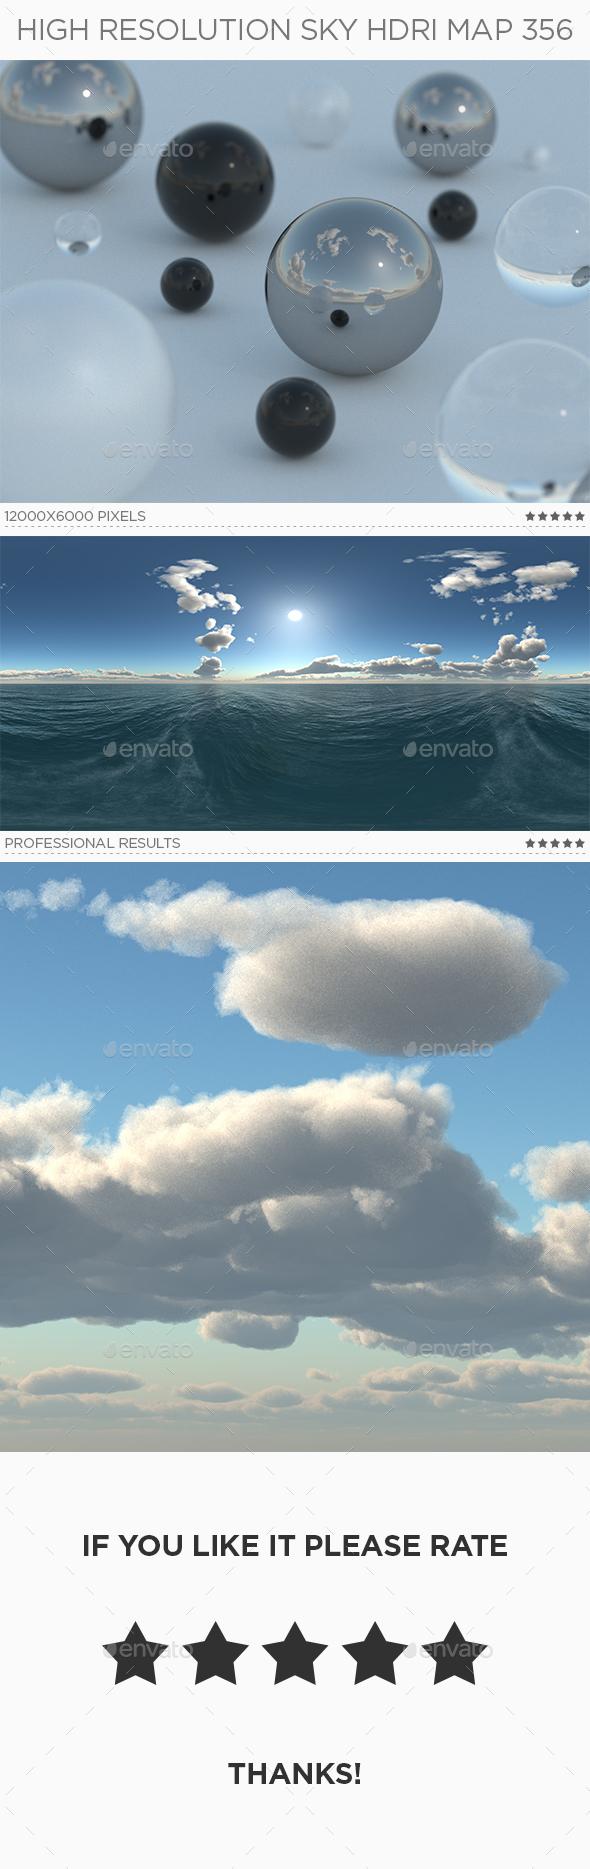 High Resolution Sky HDRi Map 356 - 3DOcean Item for Sale